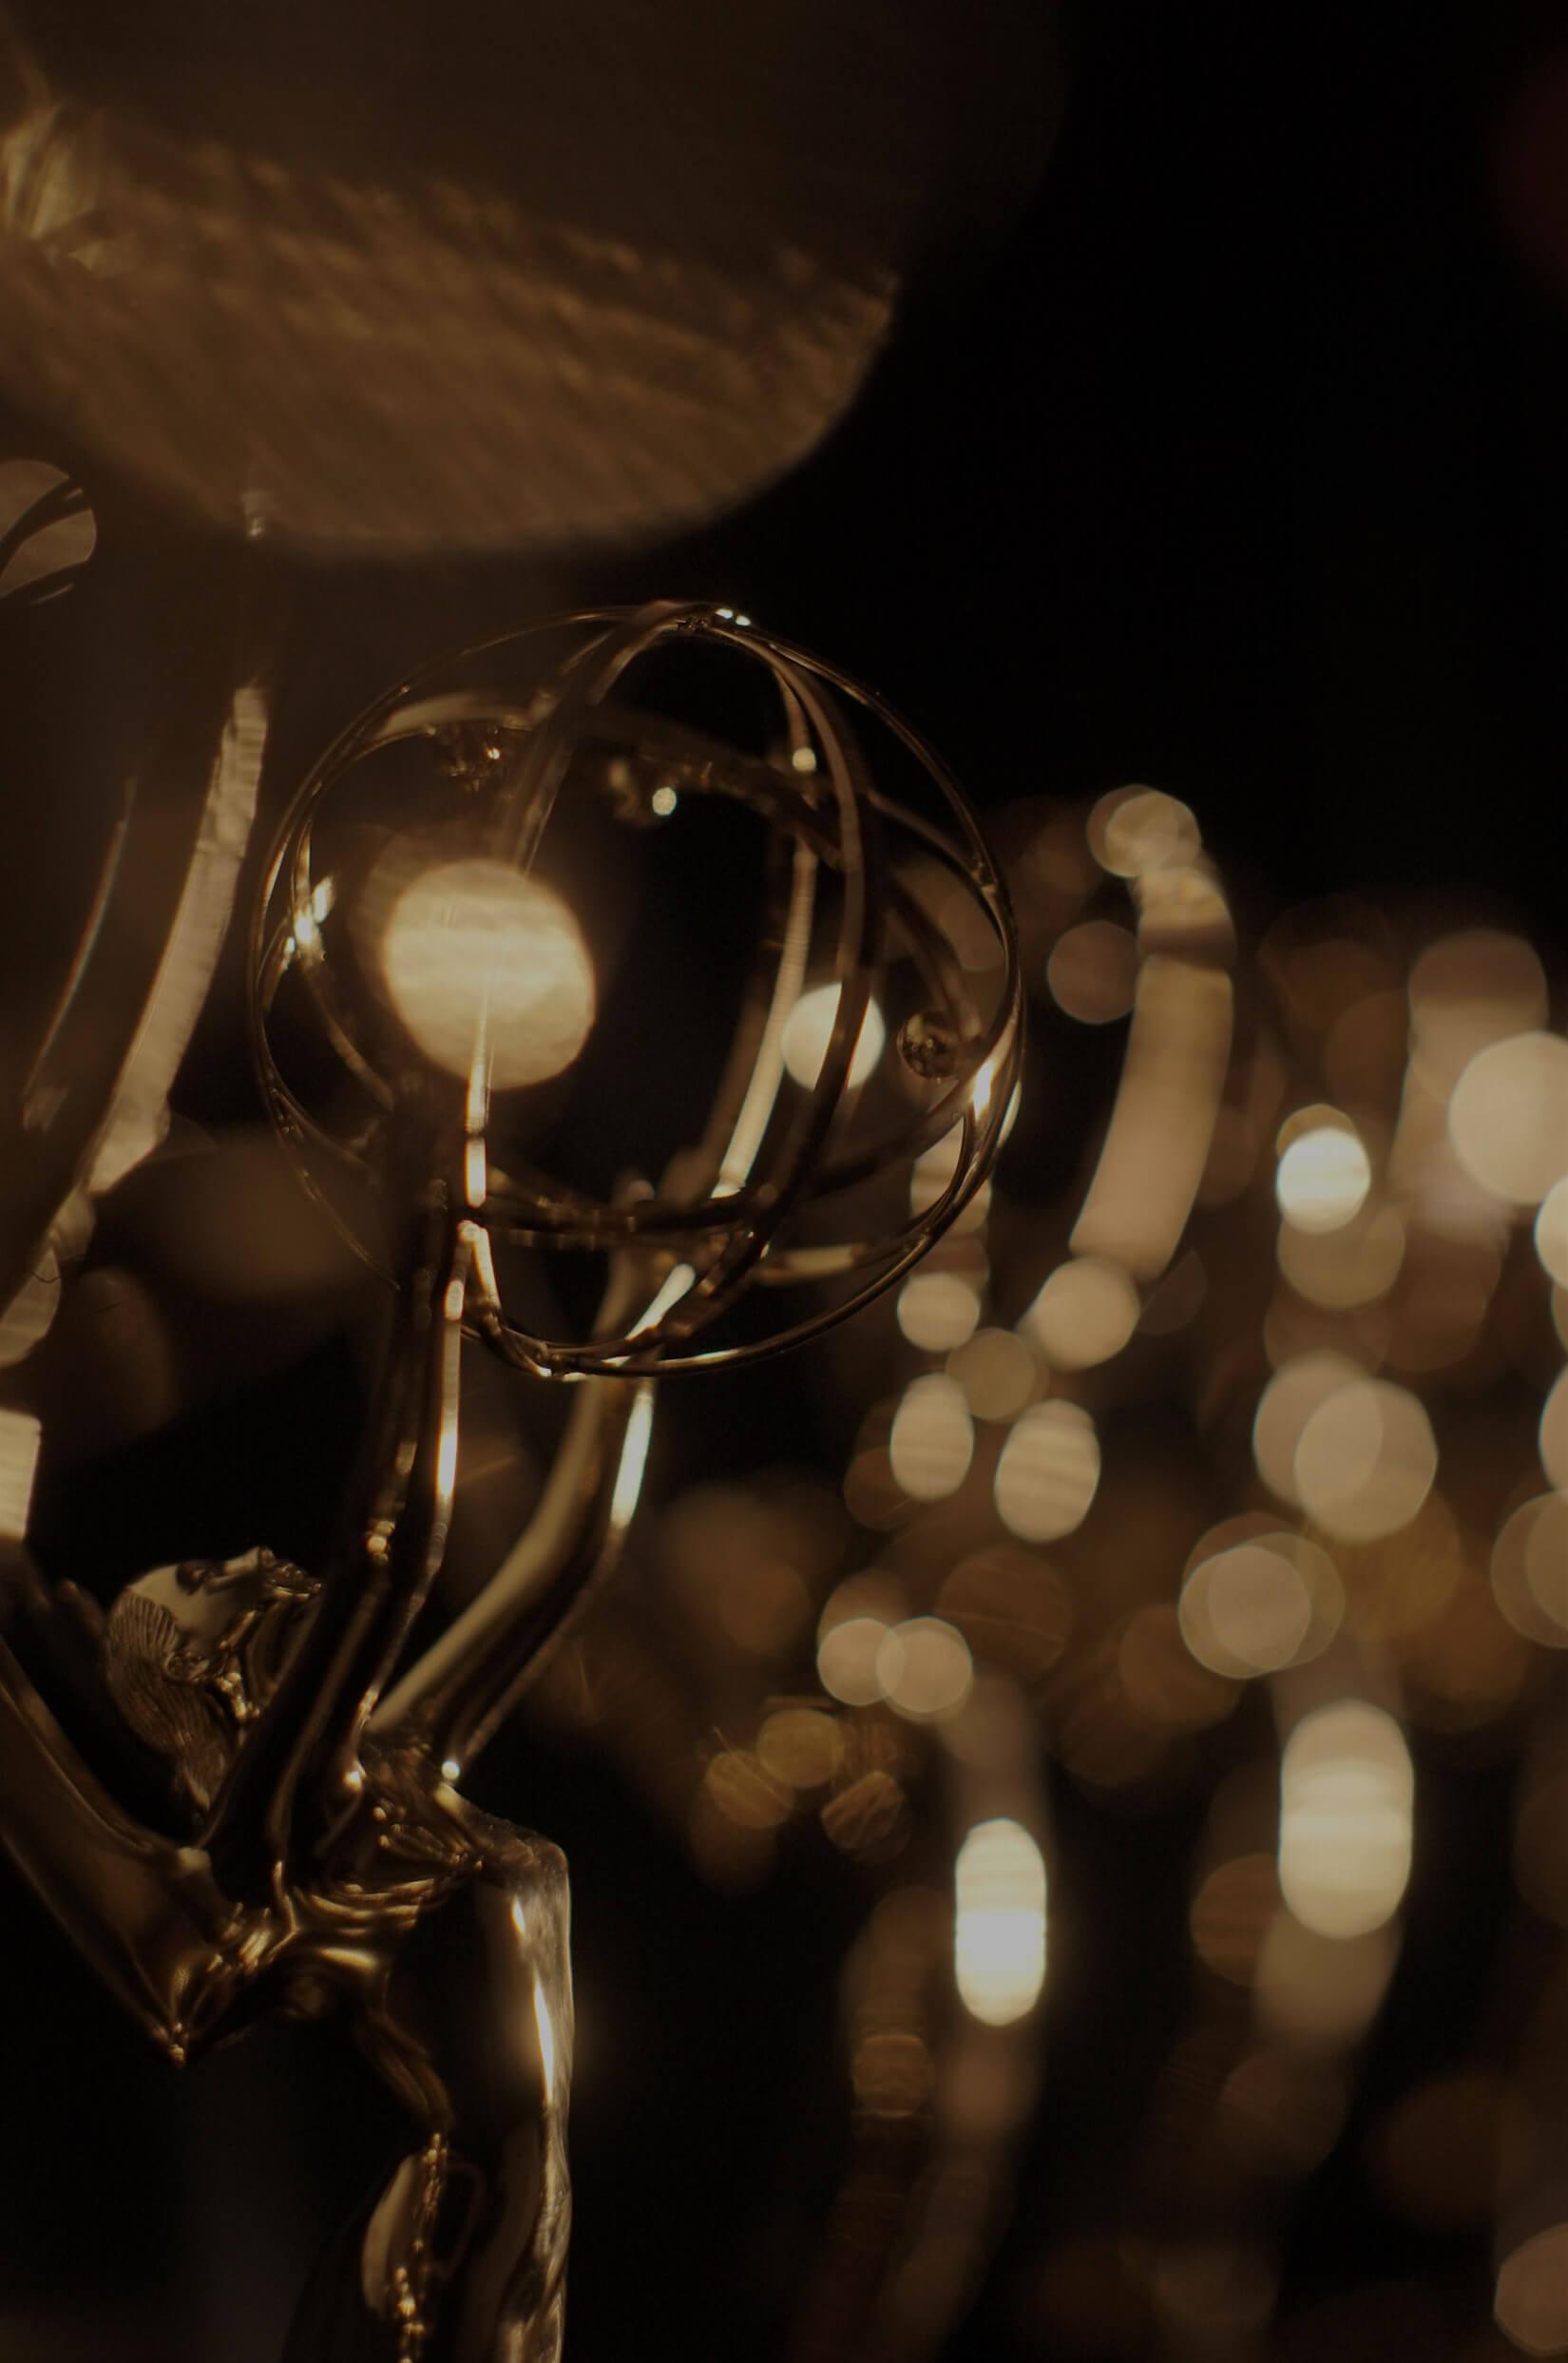 Vertical Emmy Award Statues